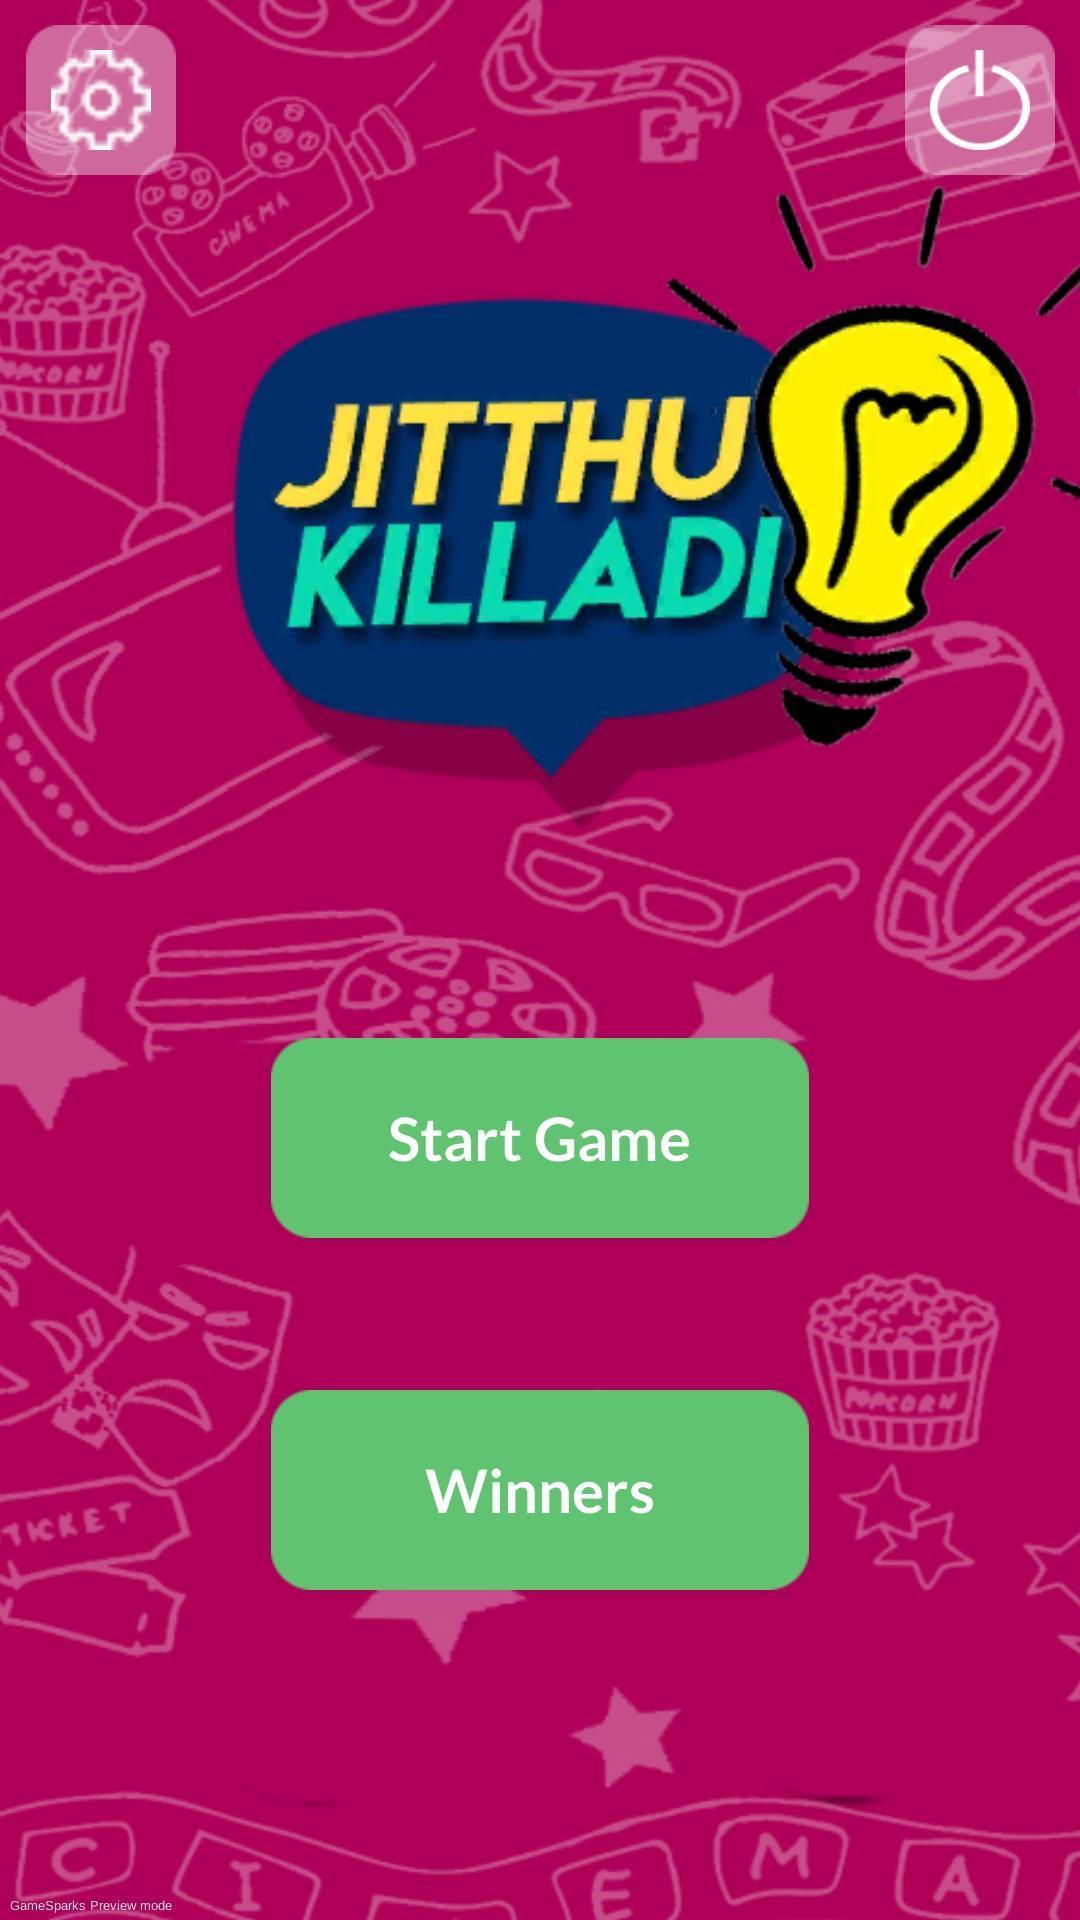 Jitthu Killadi for Android - APK Download